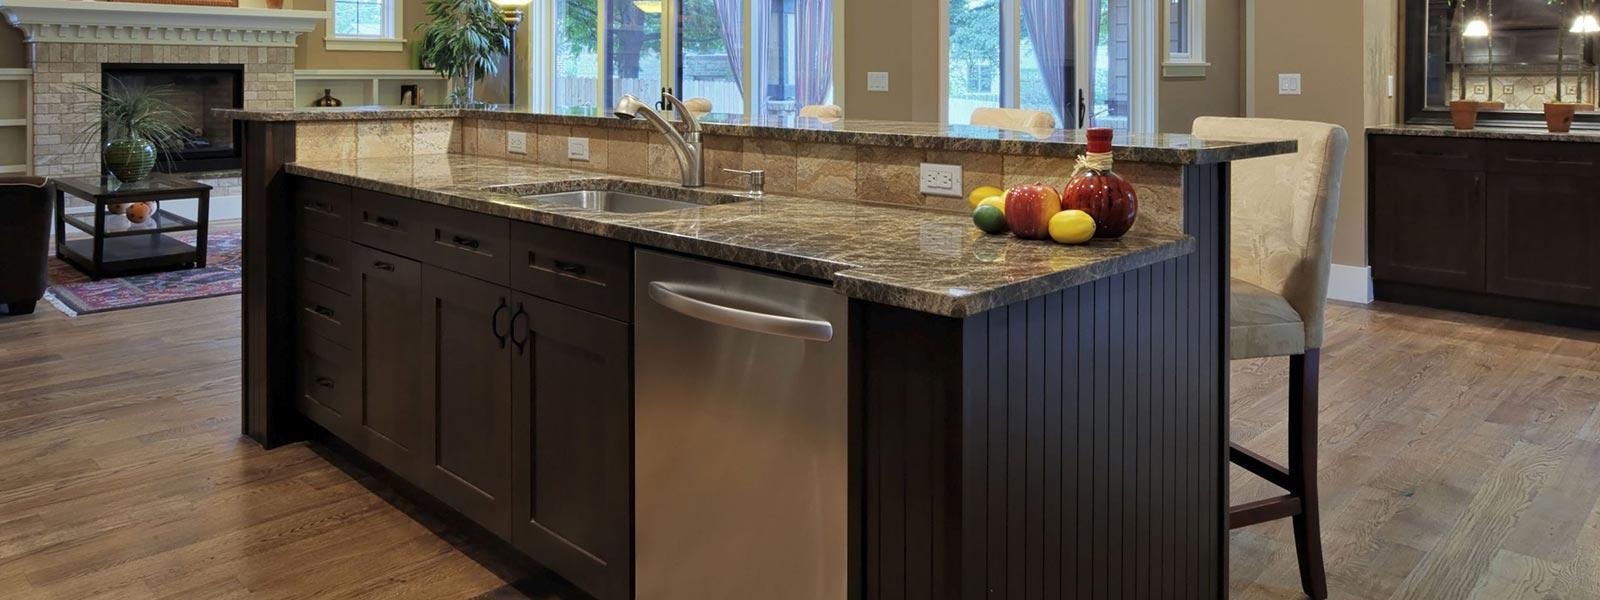 High Quality Granite Countertops Installers Plano TX